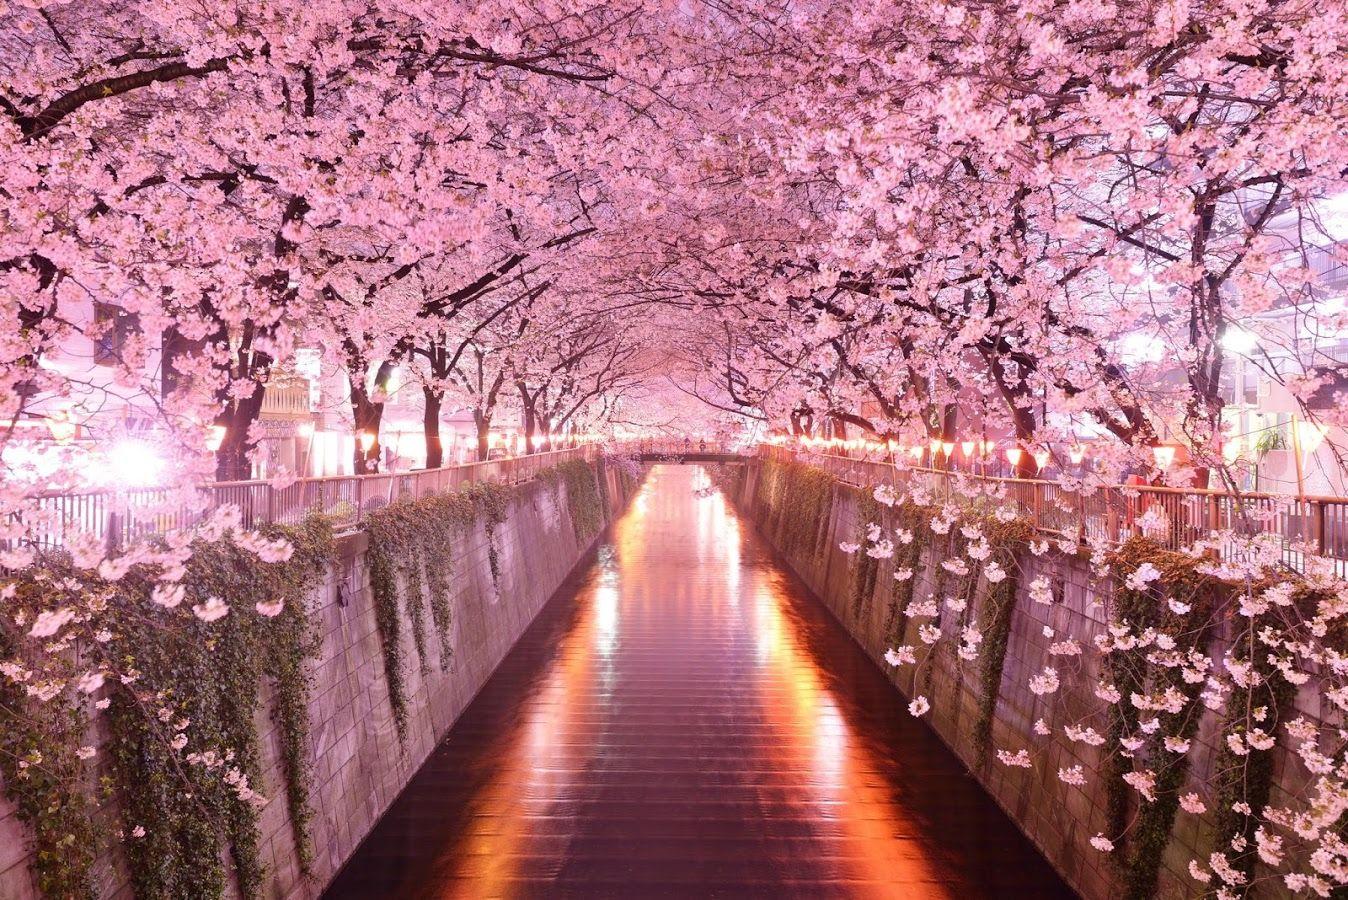 Wonderful Pink Cherry Blossom Cherry Blossom Japan Tree Tunnel